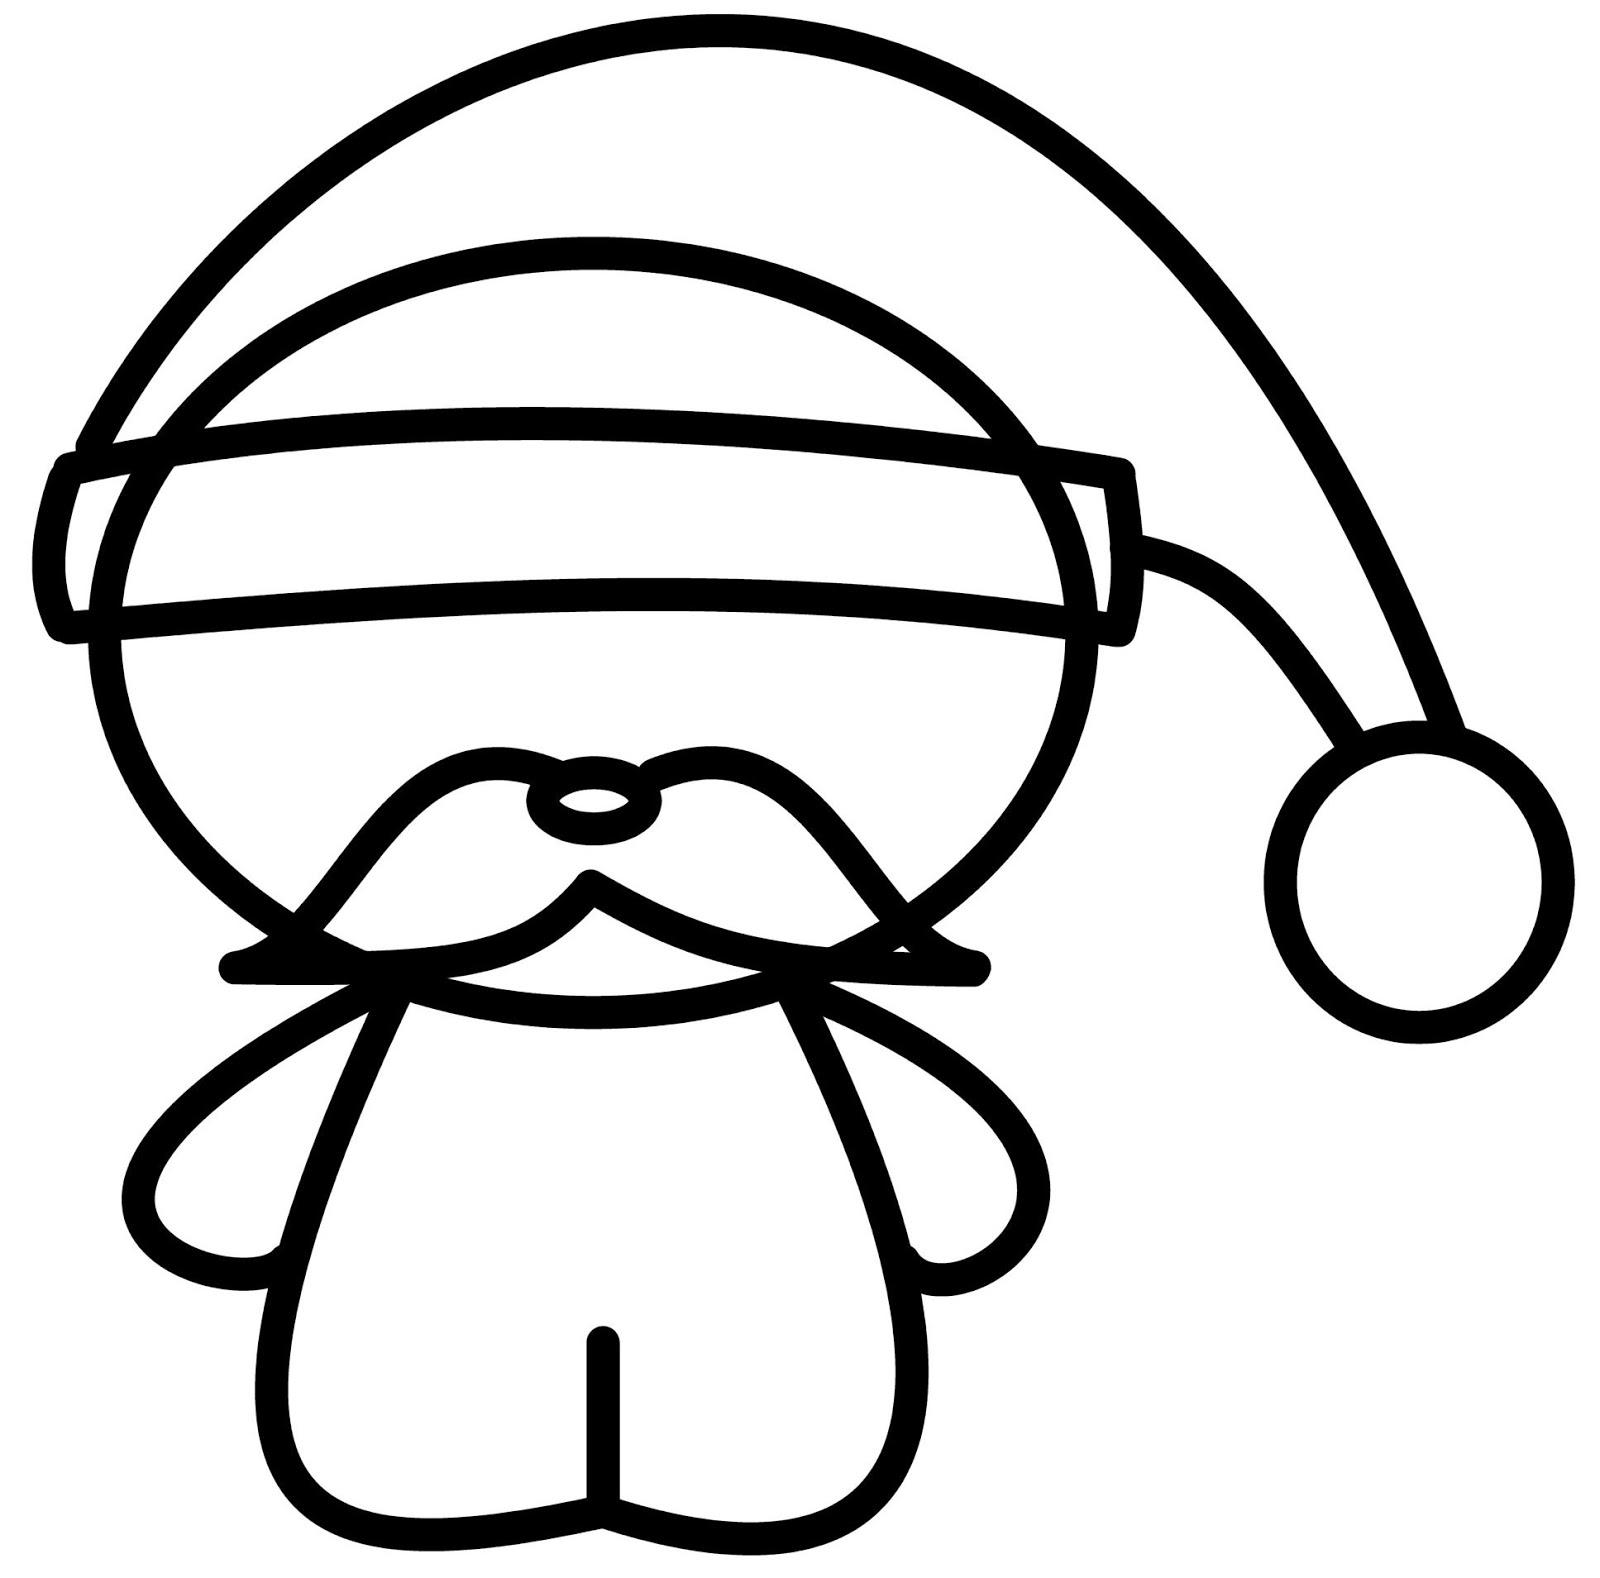 How to draw cartoons chibi santa